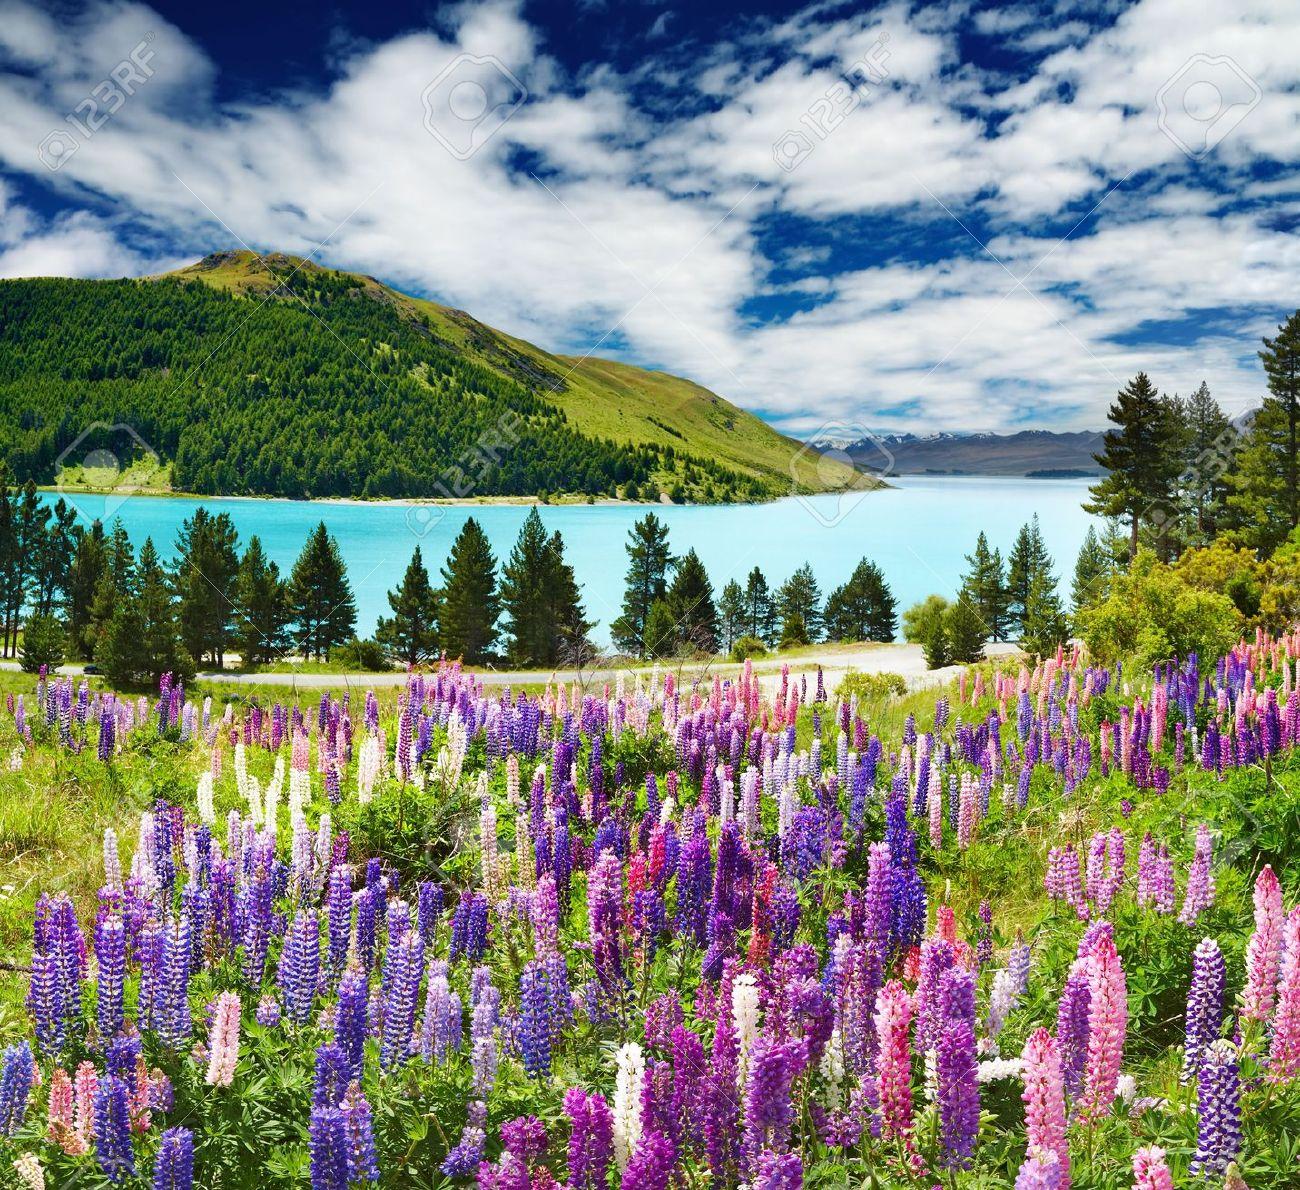 springtime landscape images u0026 stock pictures royalty free